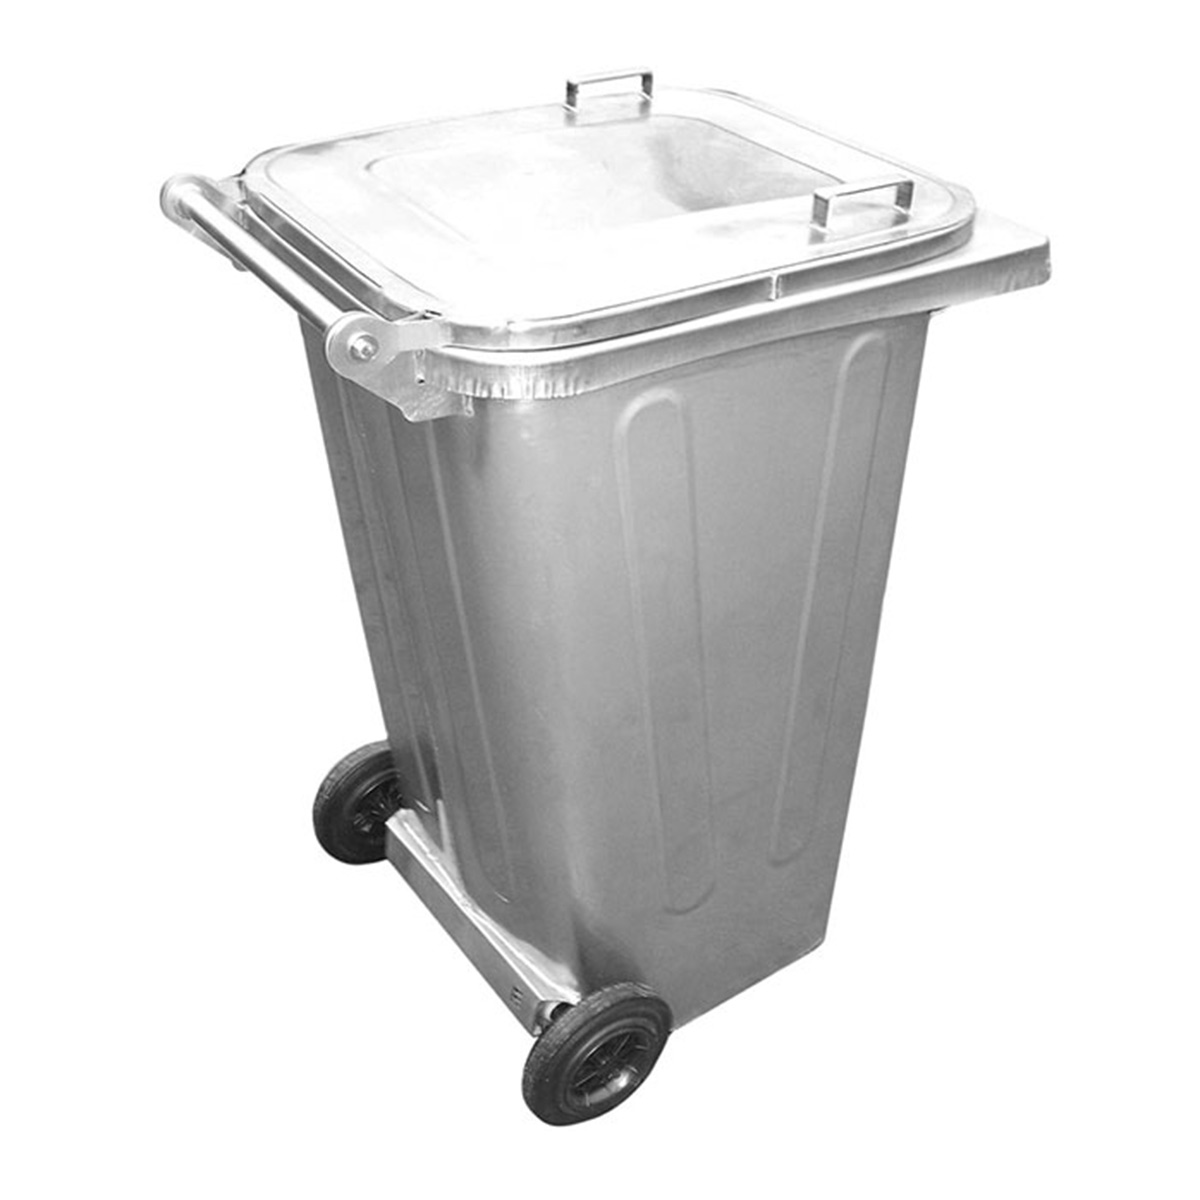 Rollabfallbehälter 120 l